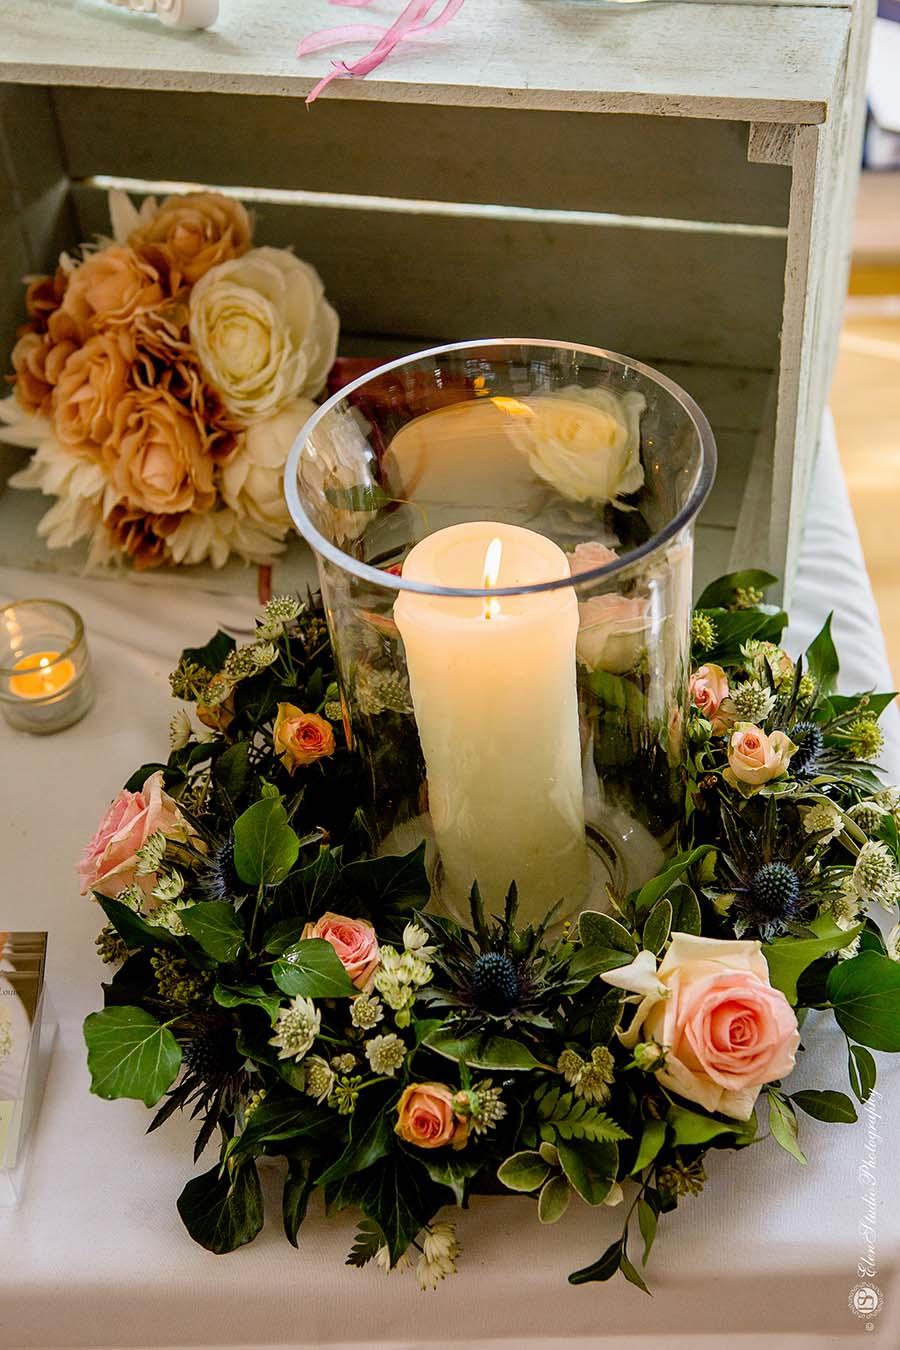 Hodsock-priory-wedding-fair-Elen-Studio-Photography-018